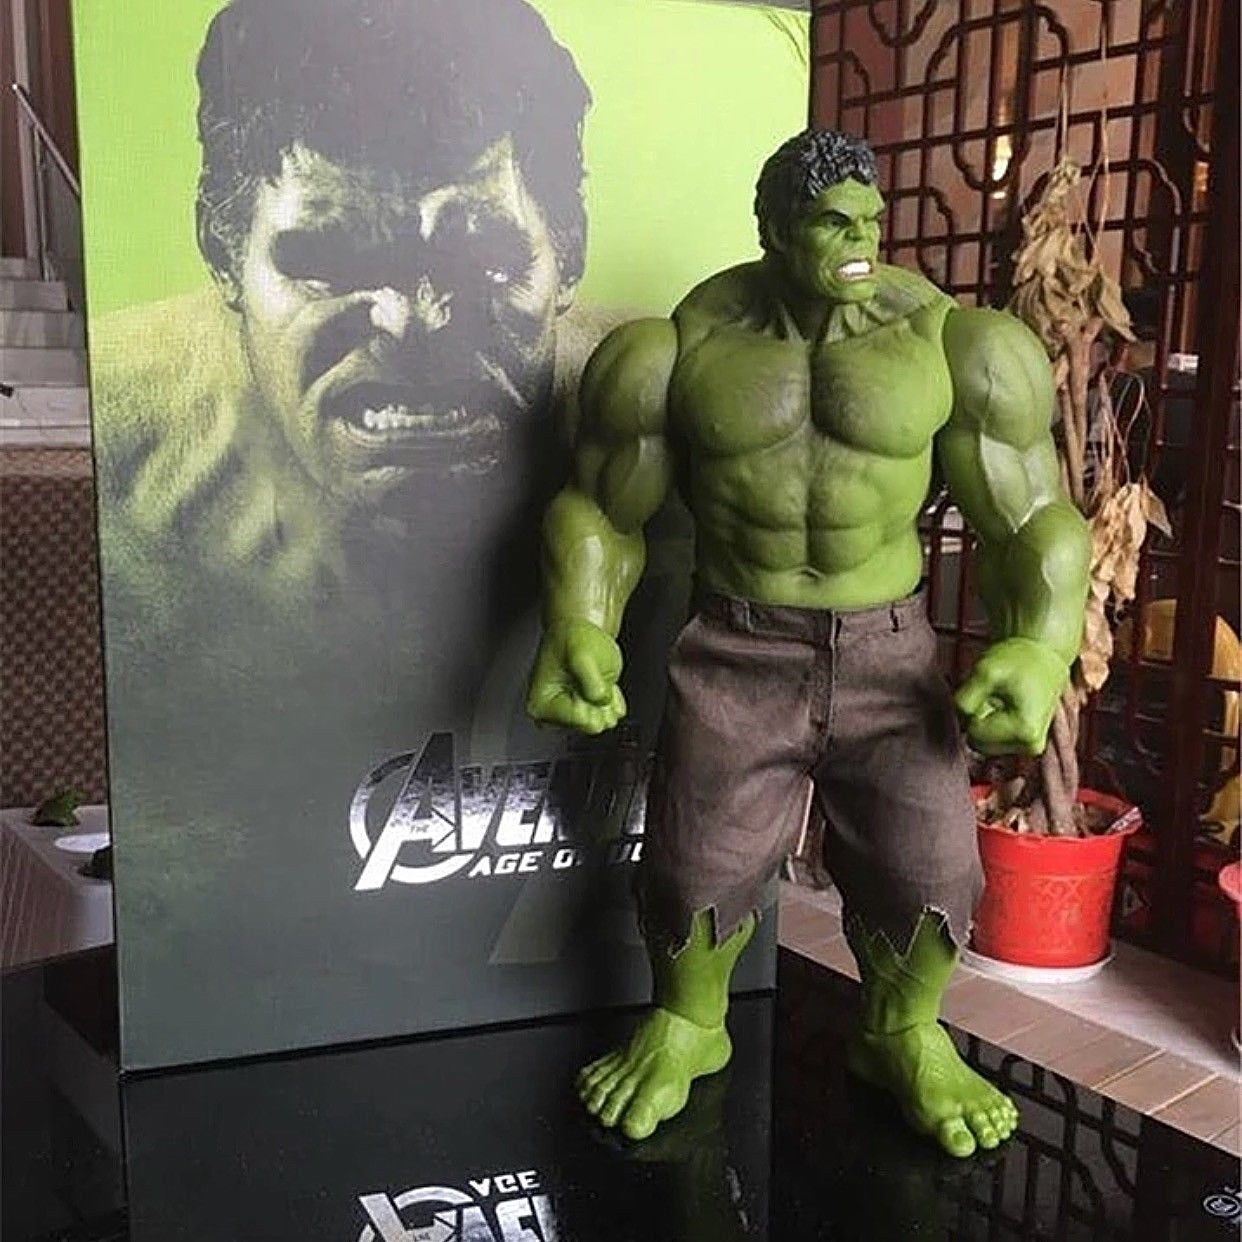 40 cm incroyable Hulk Action Figur bande dessinée Marvel Avengers chaud bobine jouets Sammlung